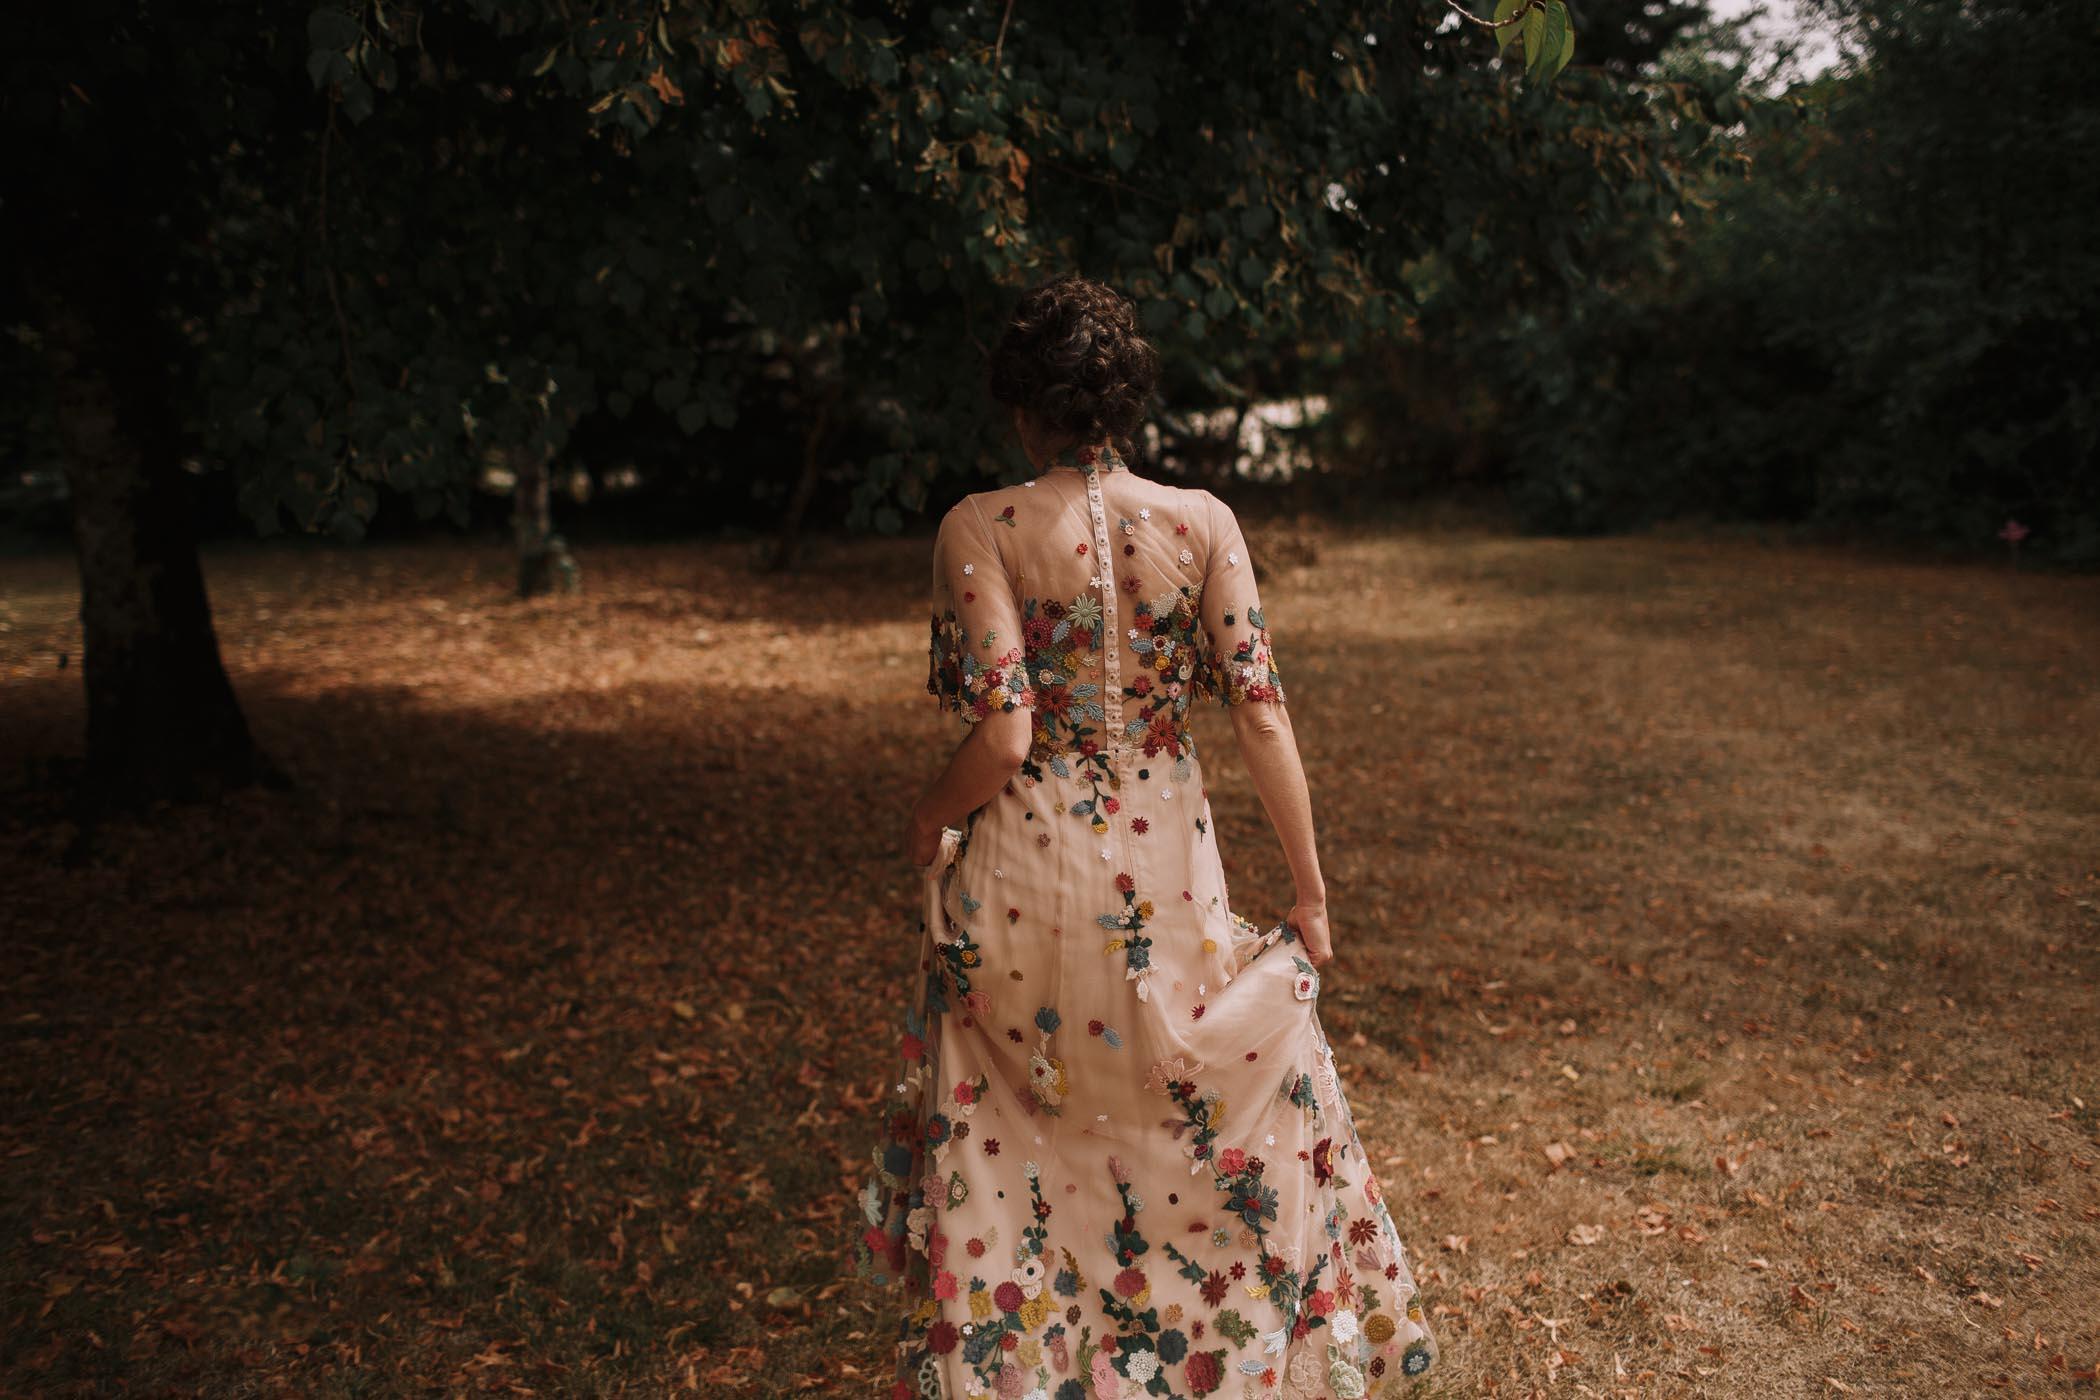 Photographe-mariage-bordeaux-jeremy-boyer-1.jpg